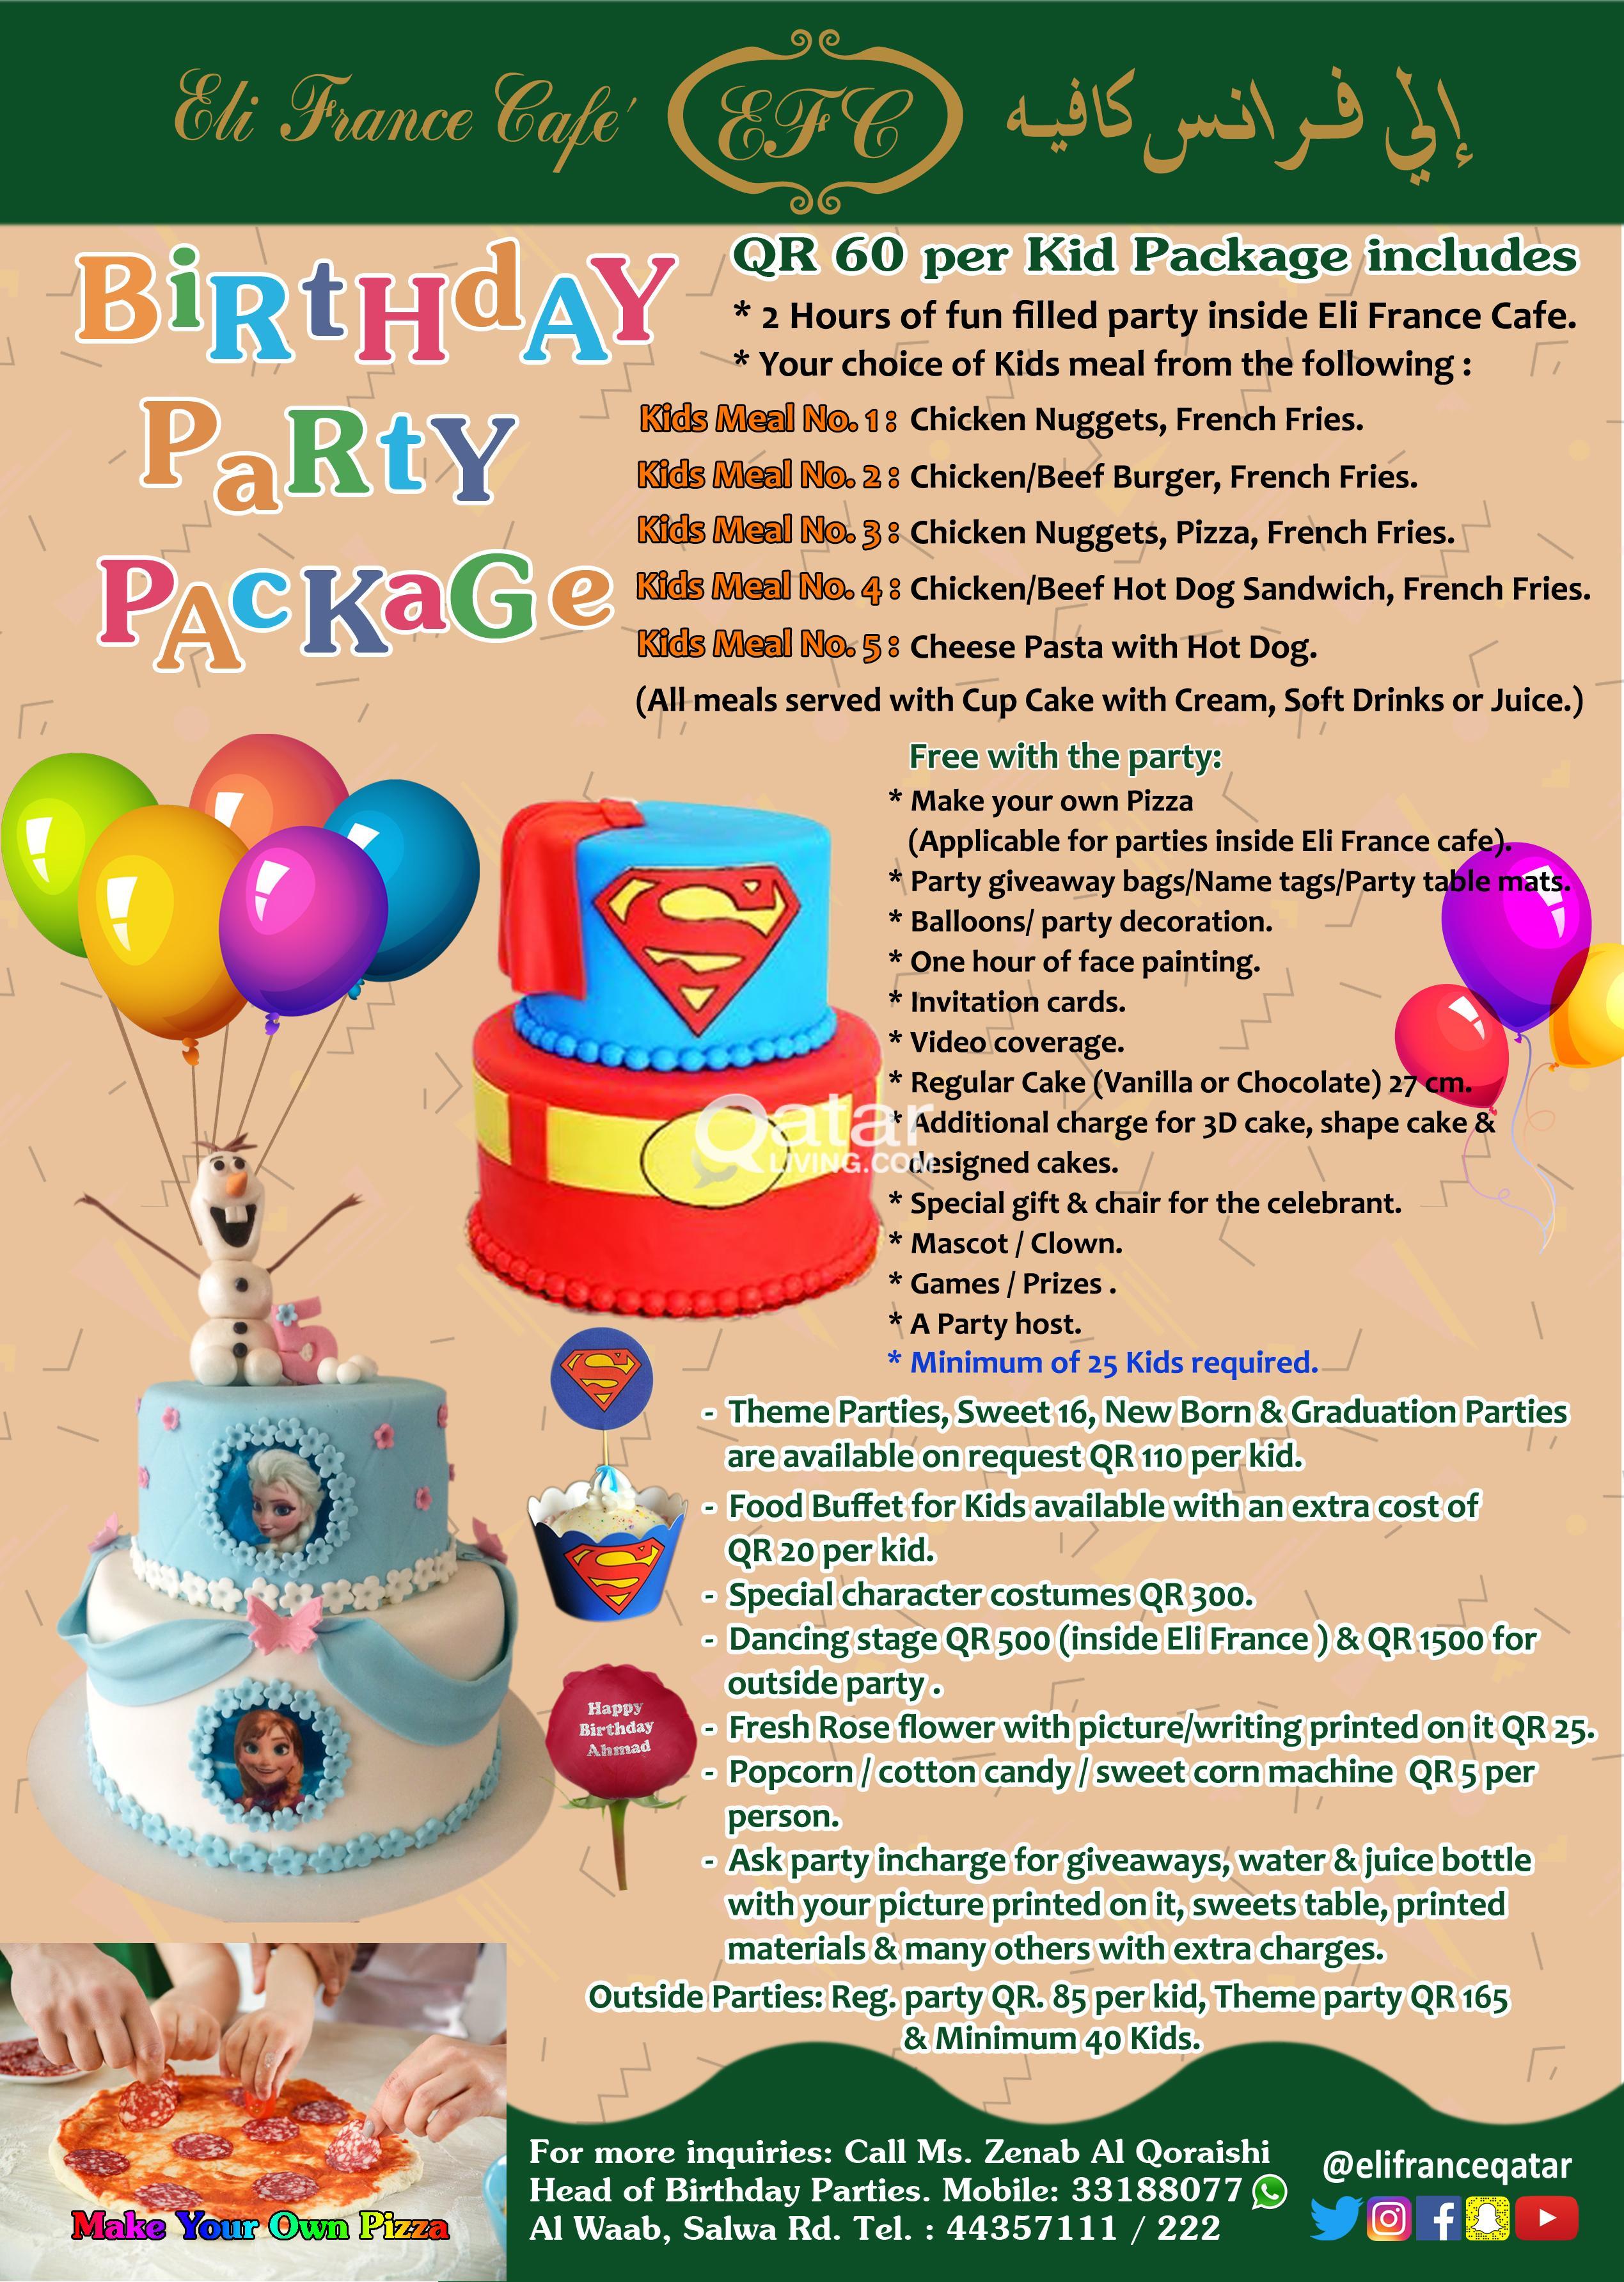 KIDS Birthday Party In Doha Qatar | Qatar Living